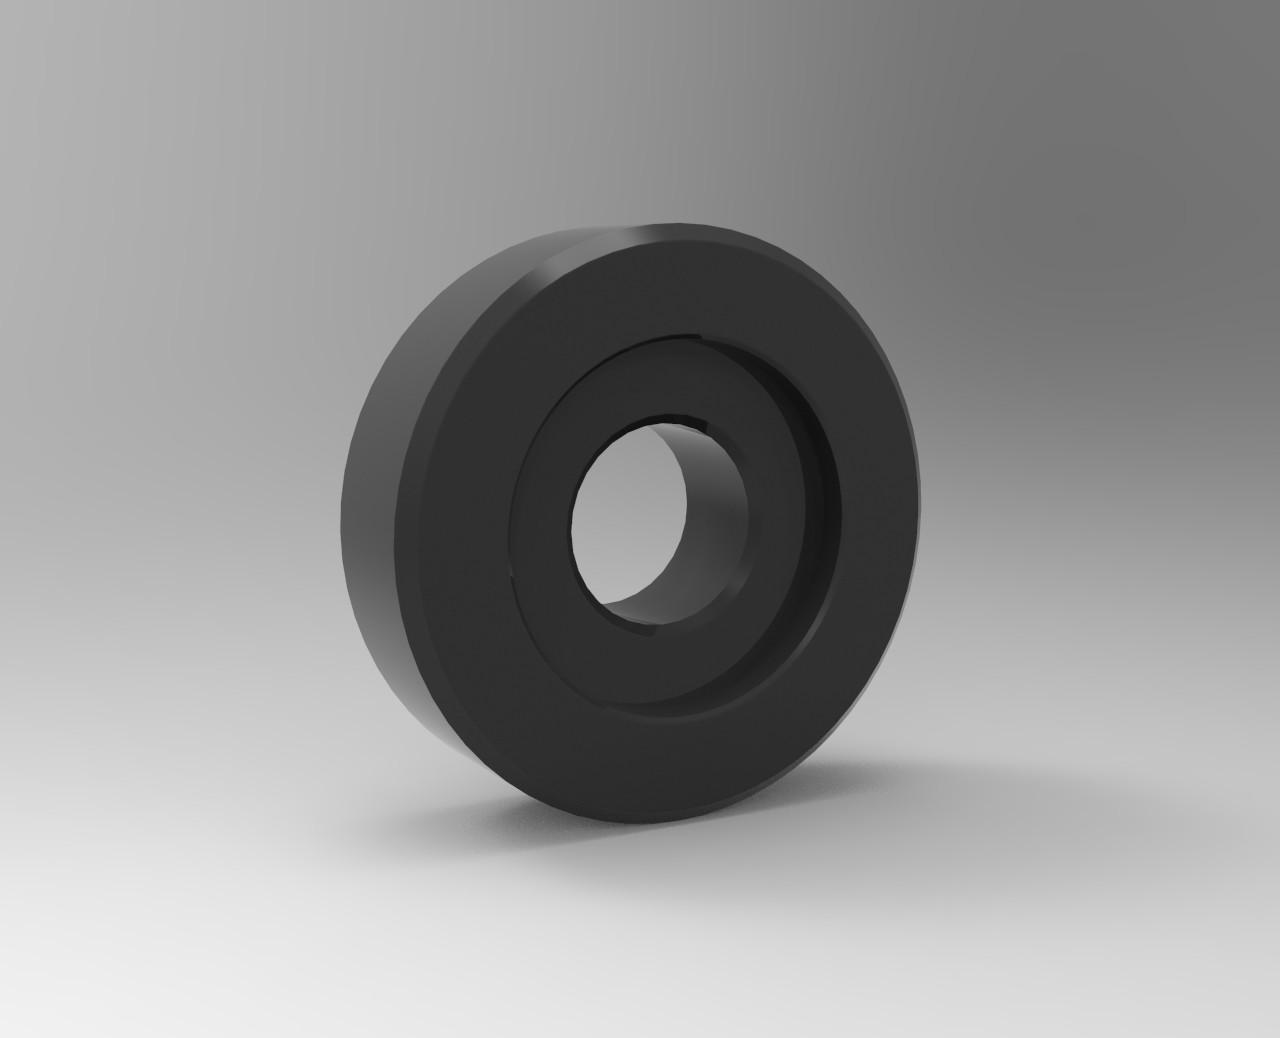 Belt Adjustment Wheel - Autohelm 4000, ST4000 Wheelpilot